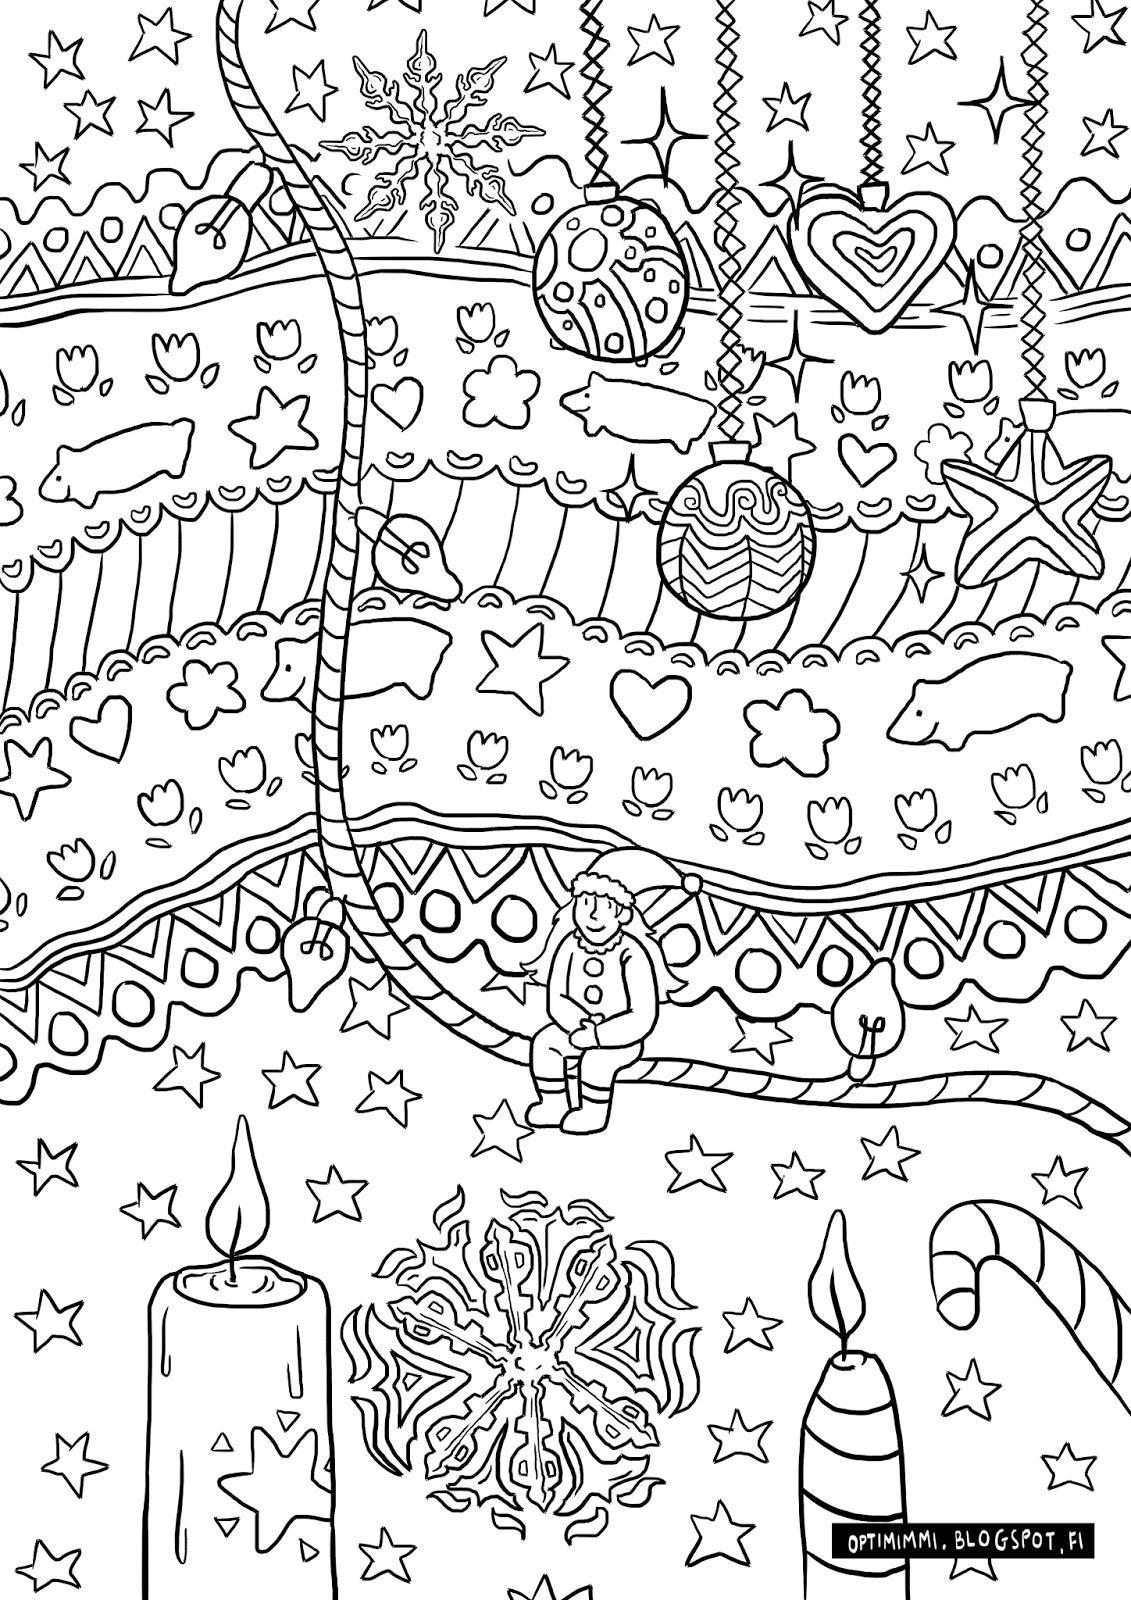 optimimmi 2016 coloring pages 2016 värityskuvat